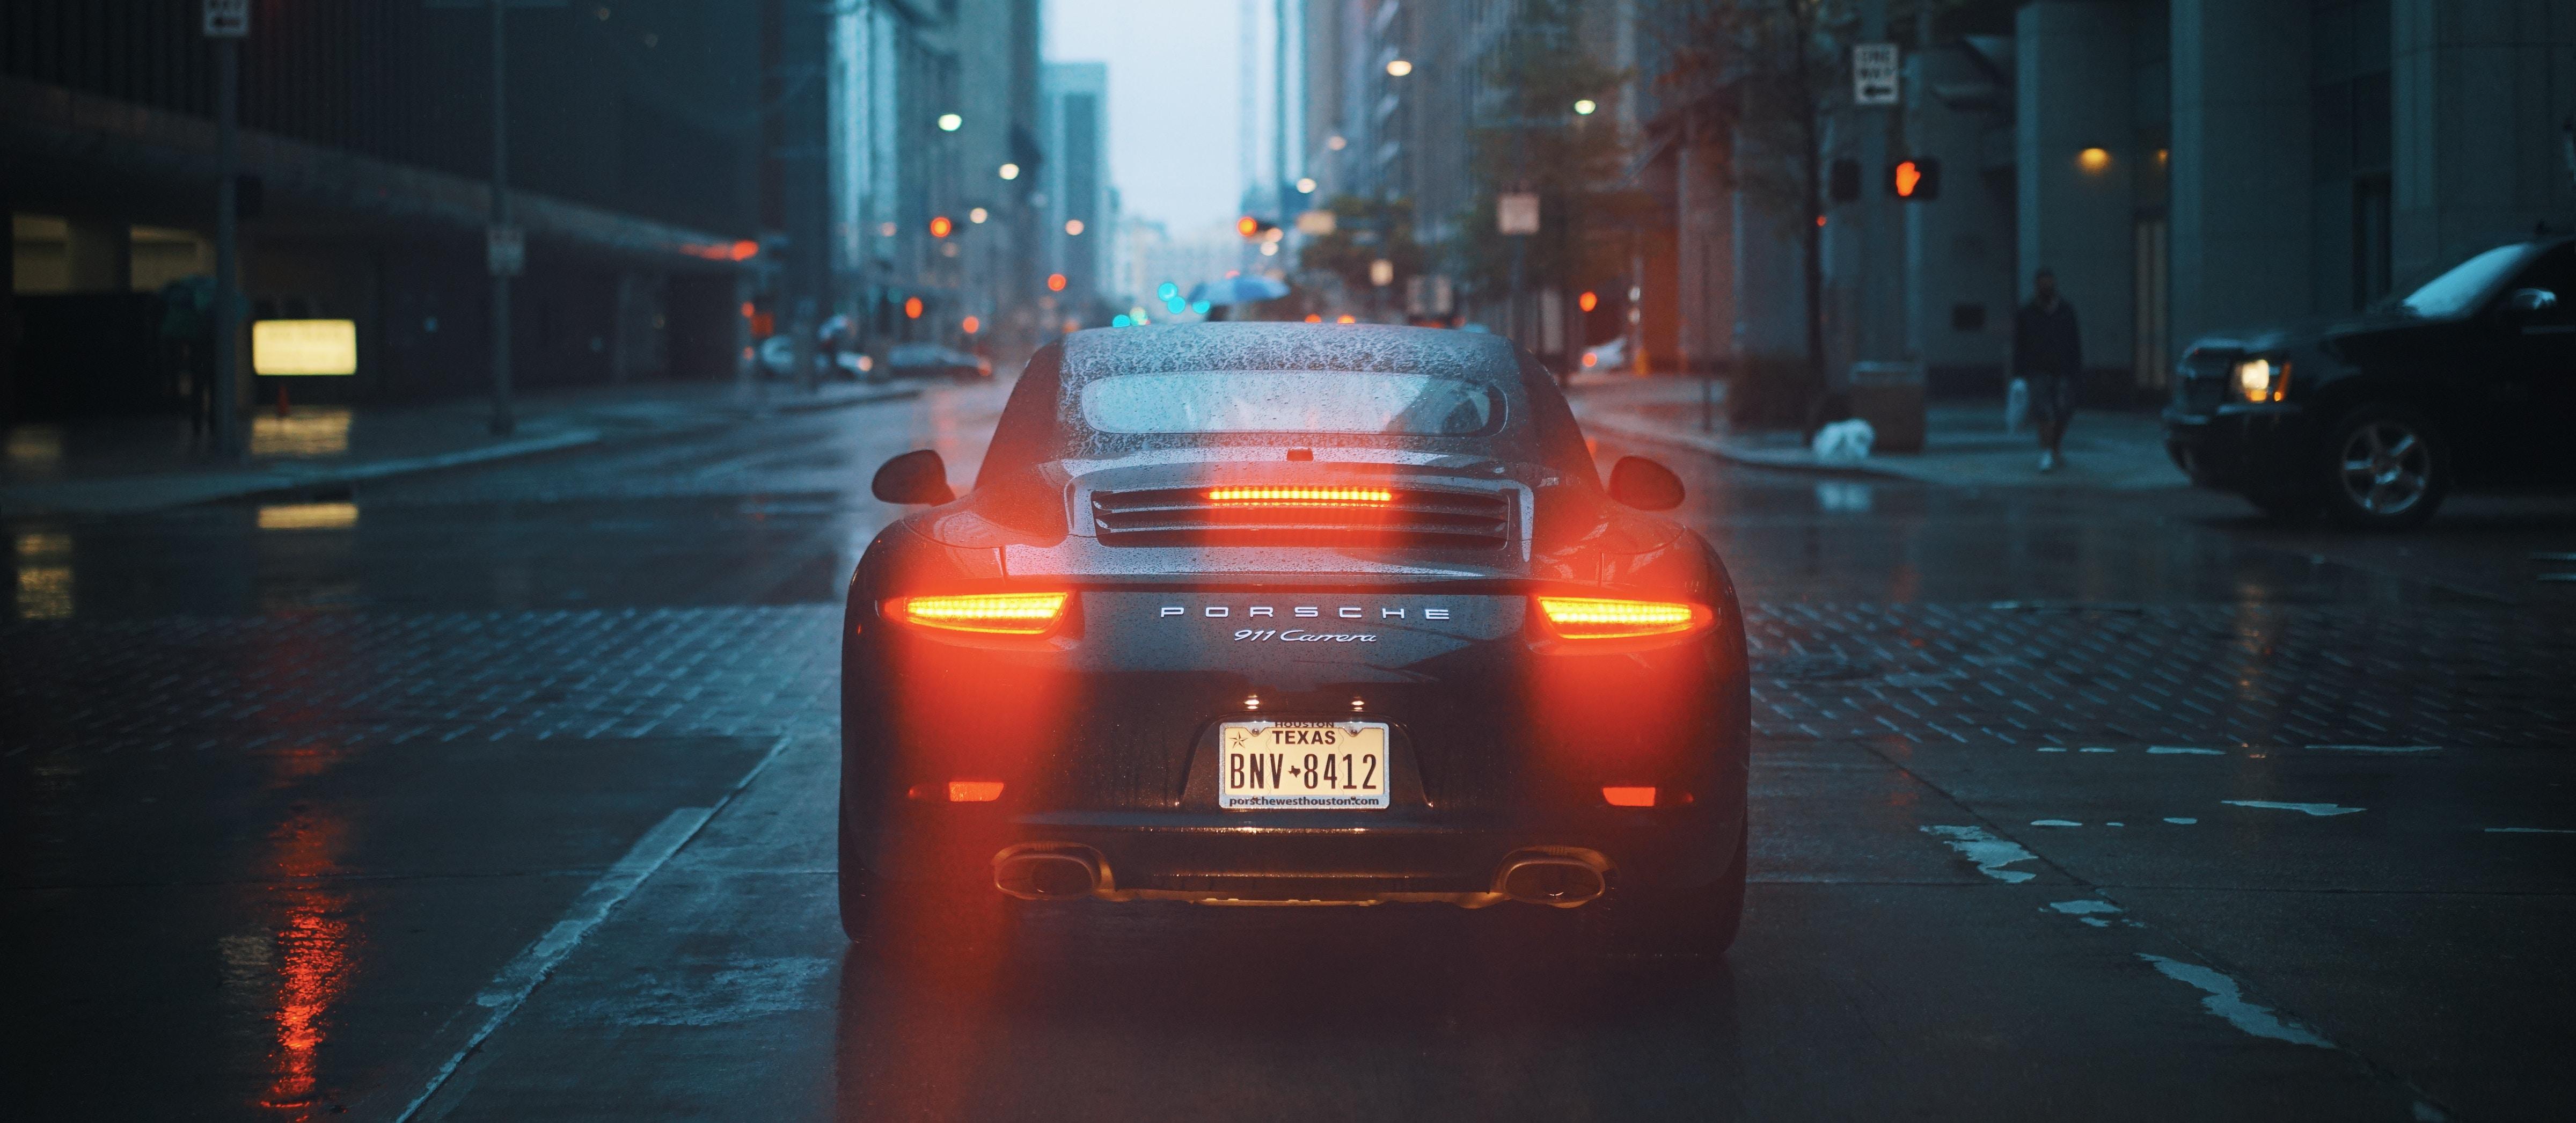 Porsche Porsche 911 Carrera S sports car Tailights bokeh urban rain